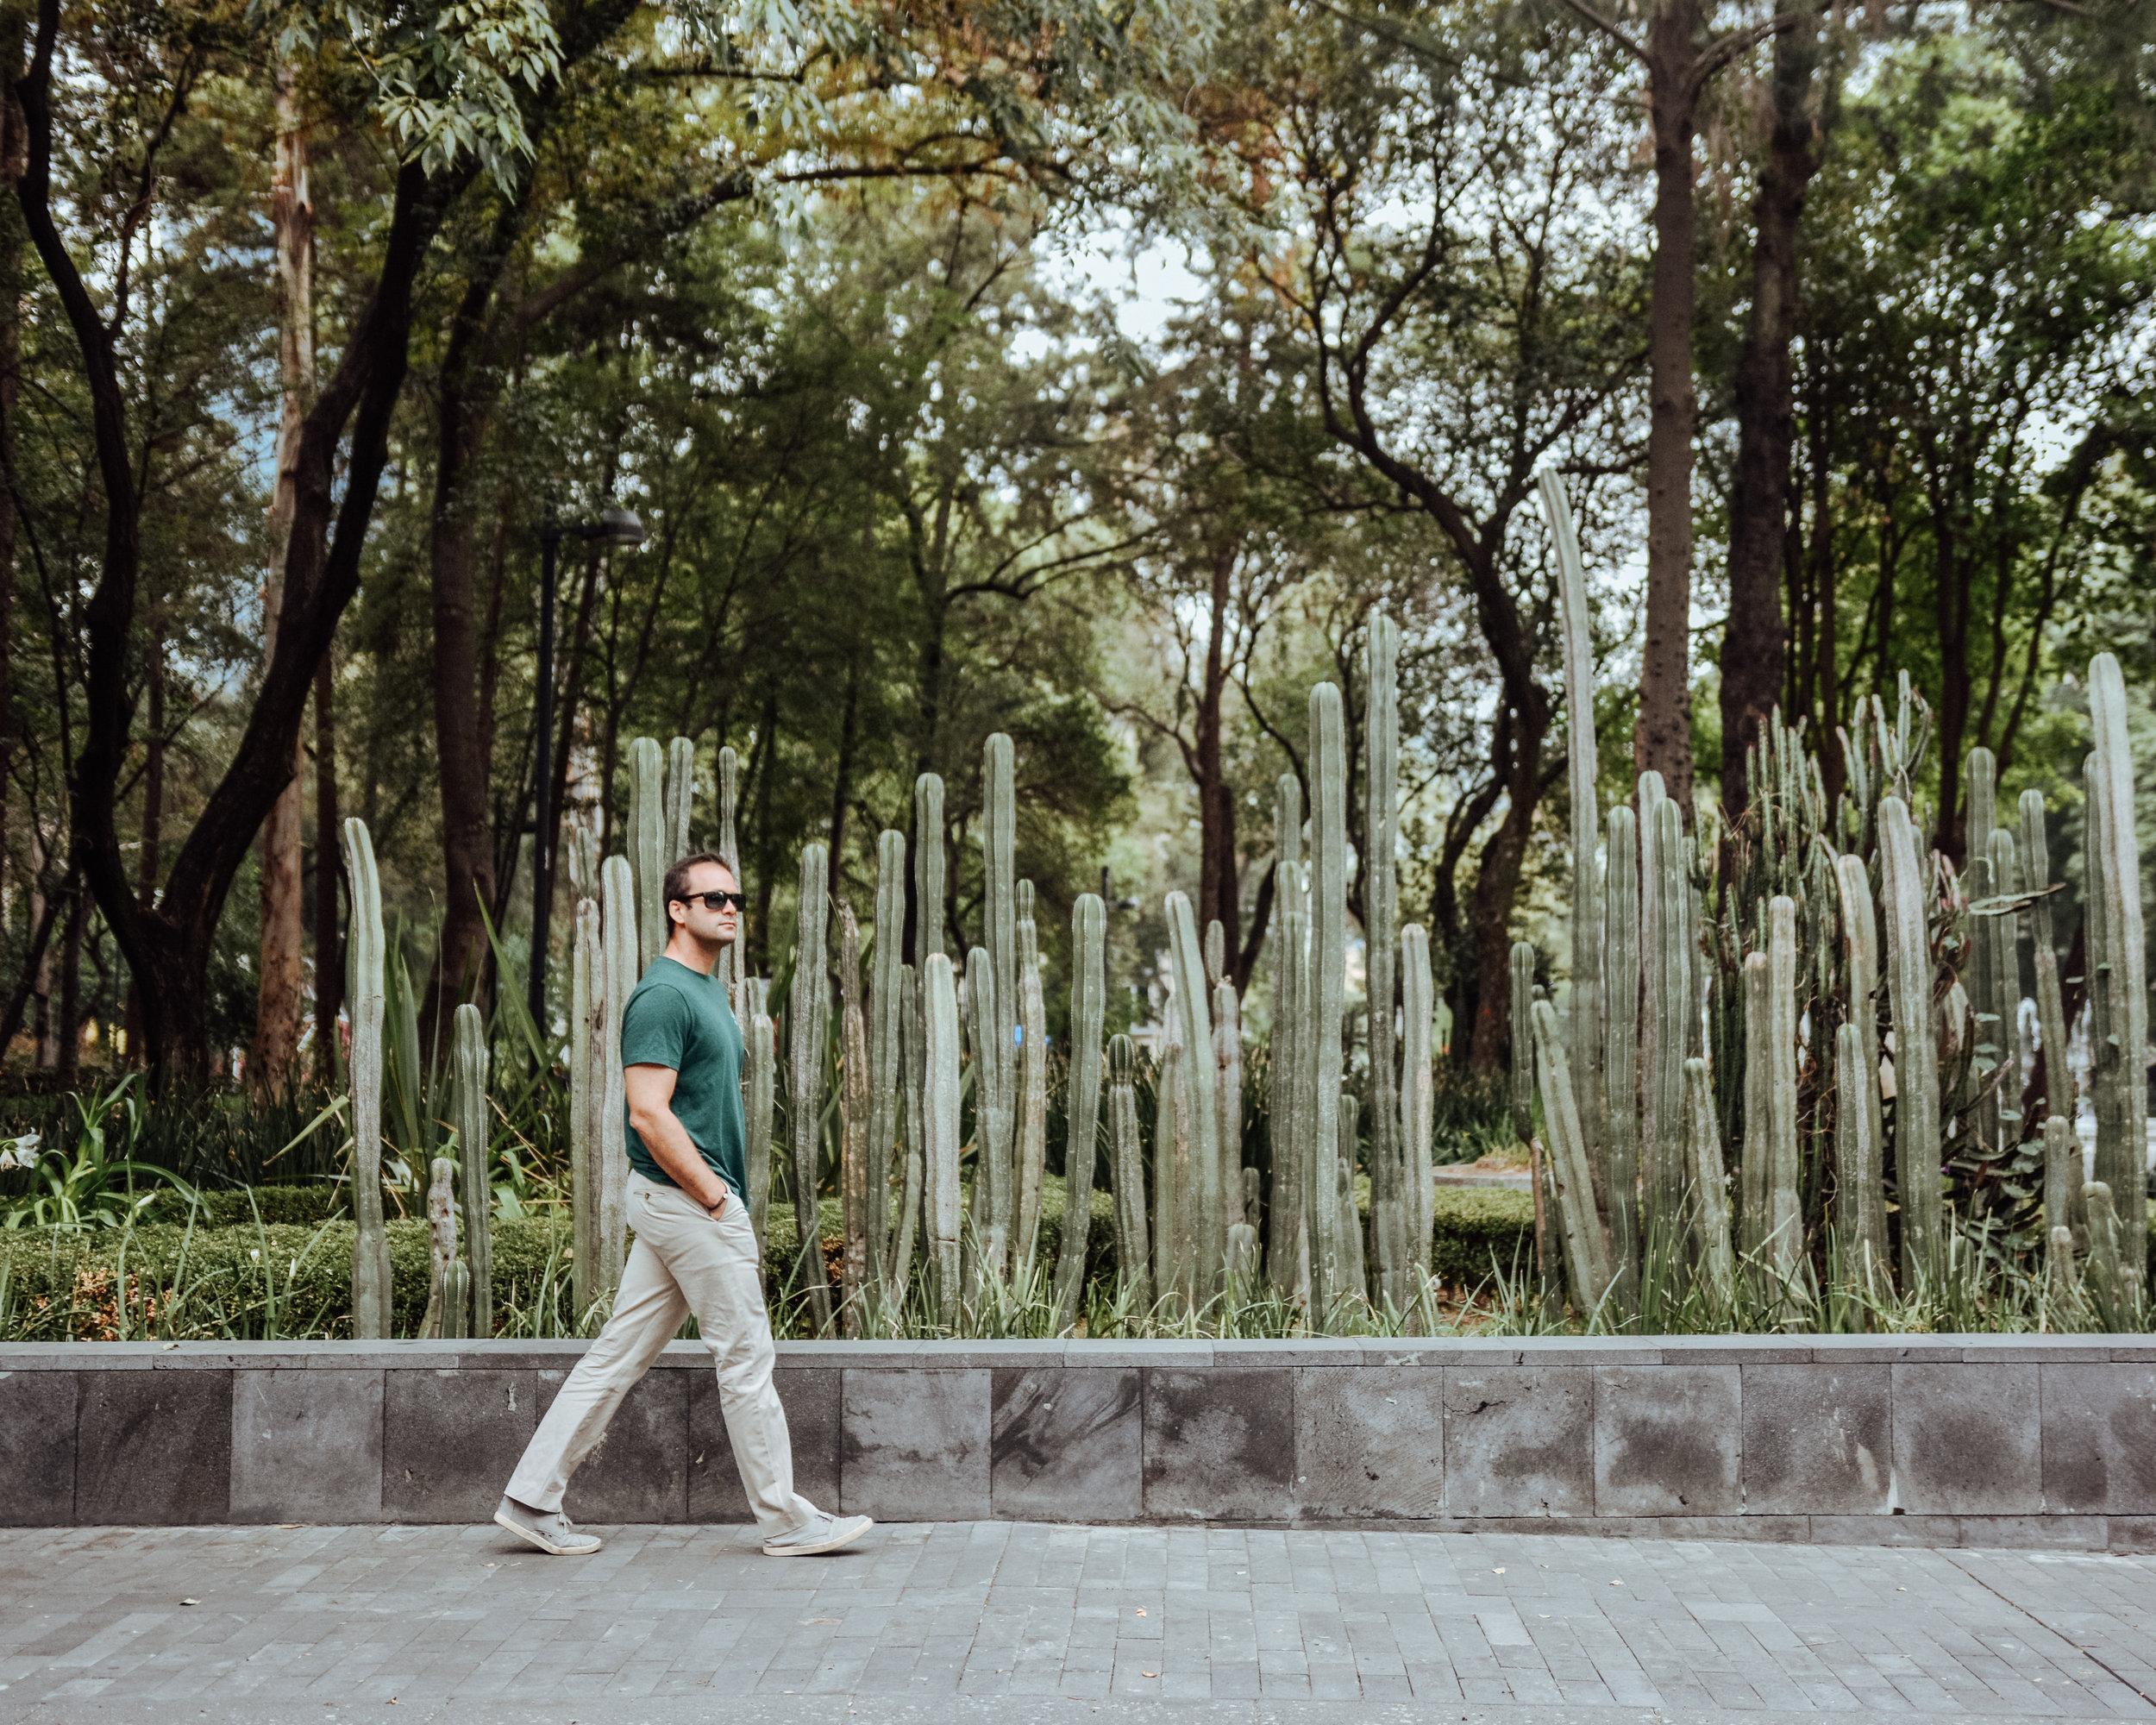 Walking around Mexico City